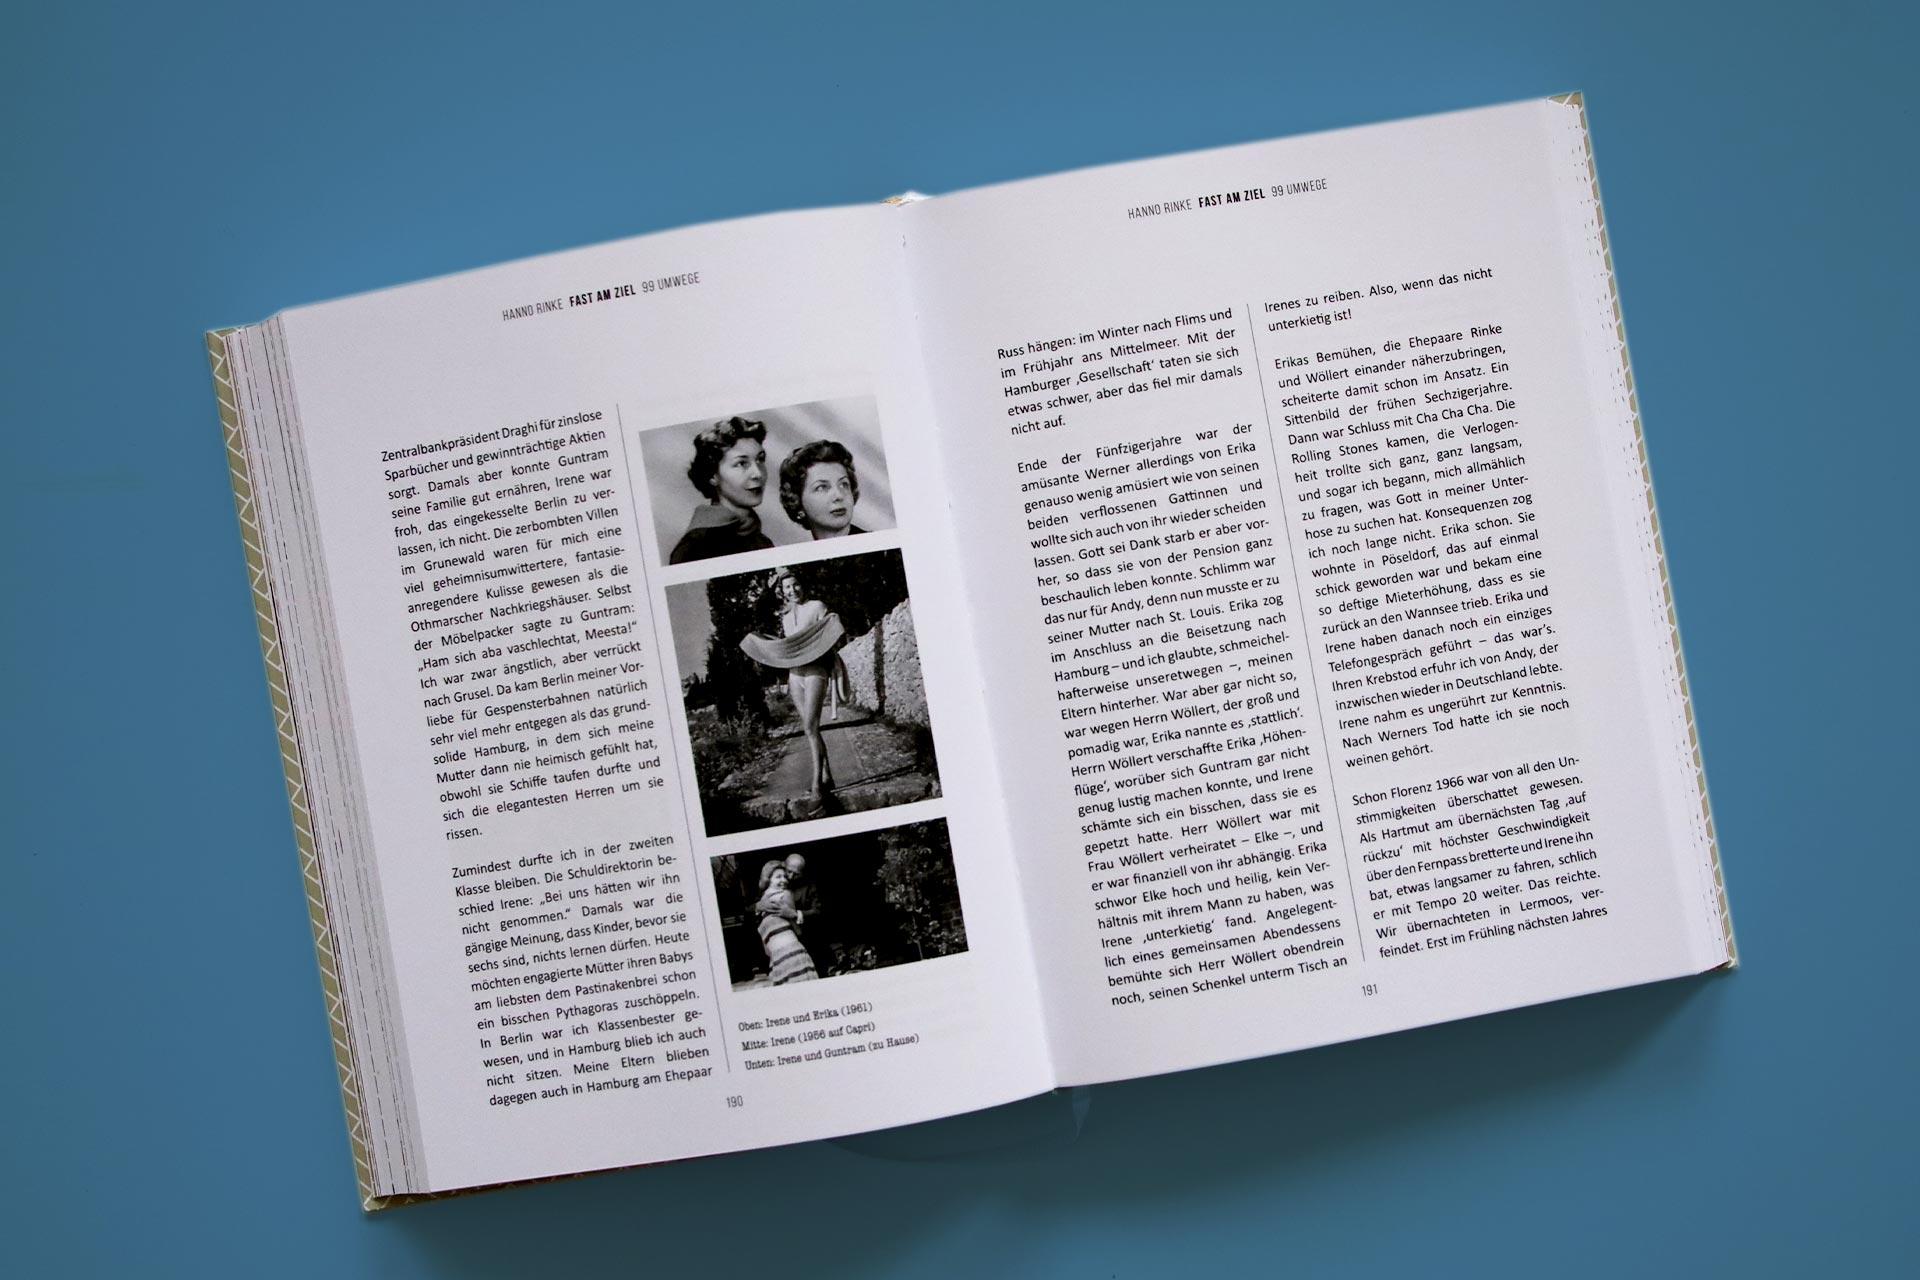 Reich bebildert entführt Hanno Rinke in sein turbulentes Leben